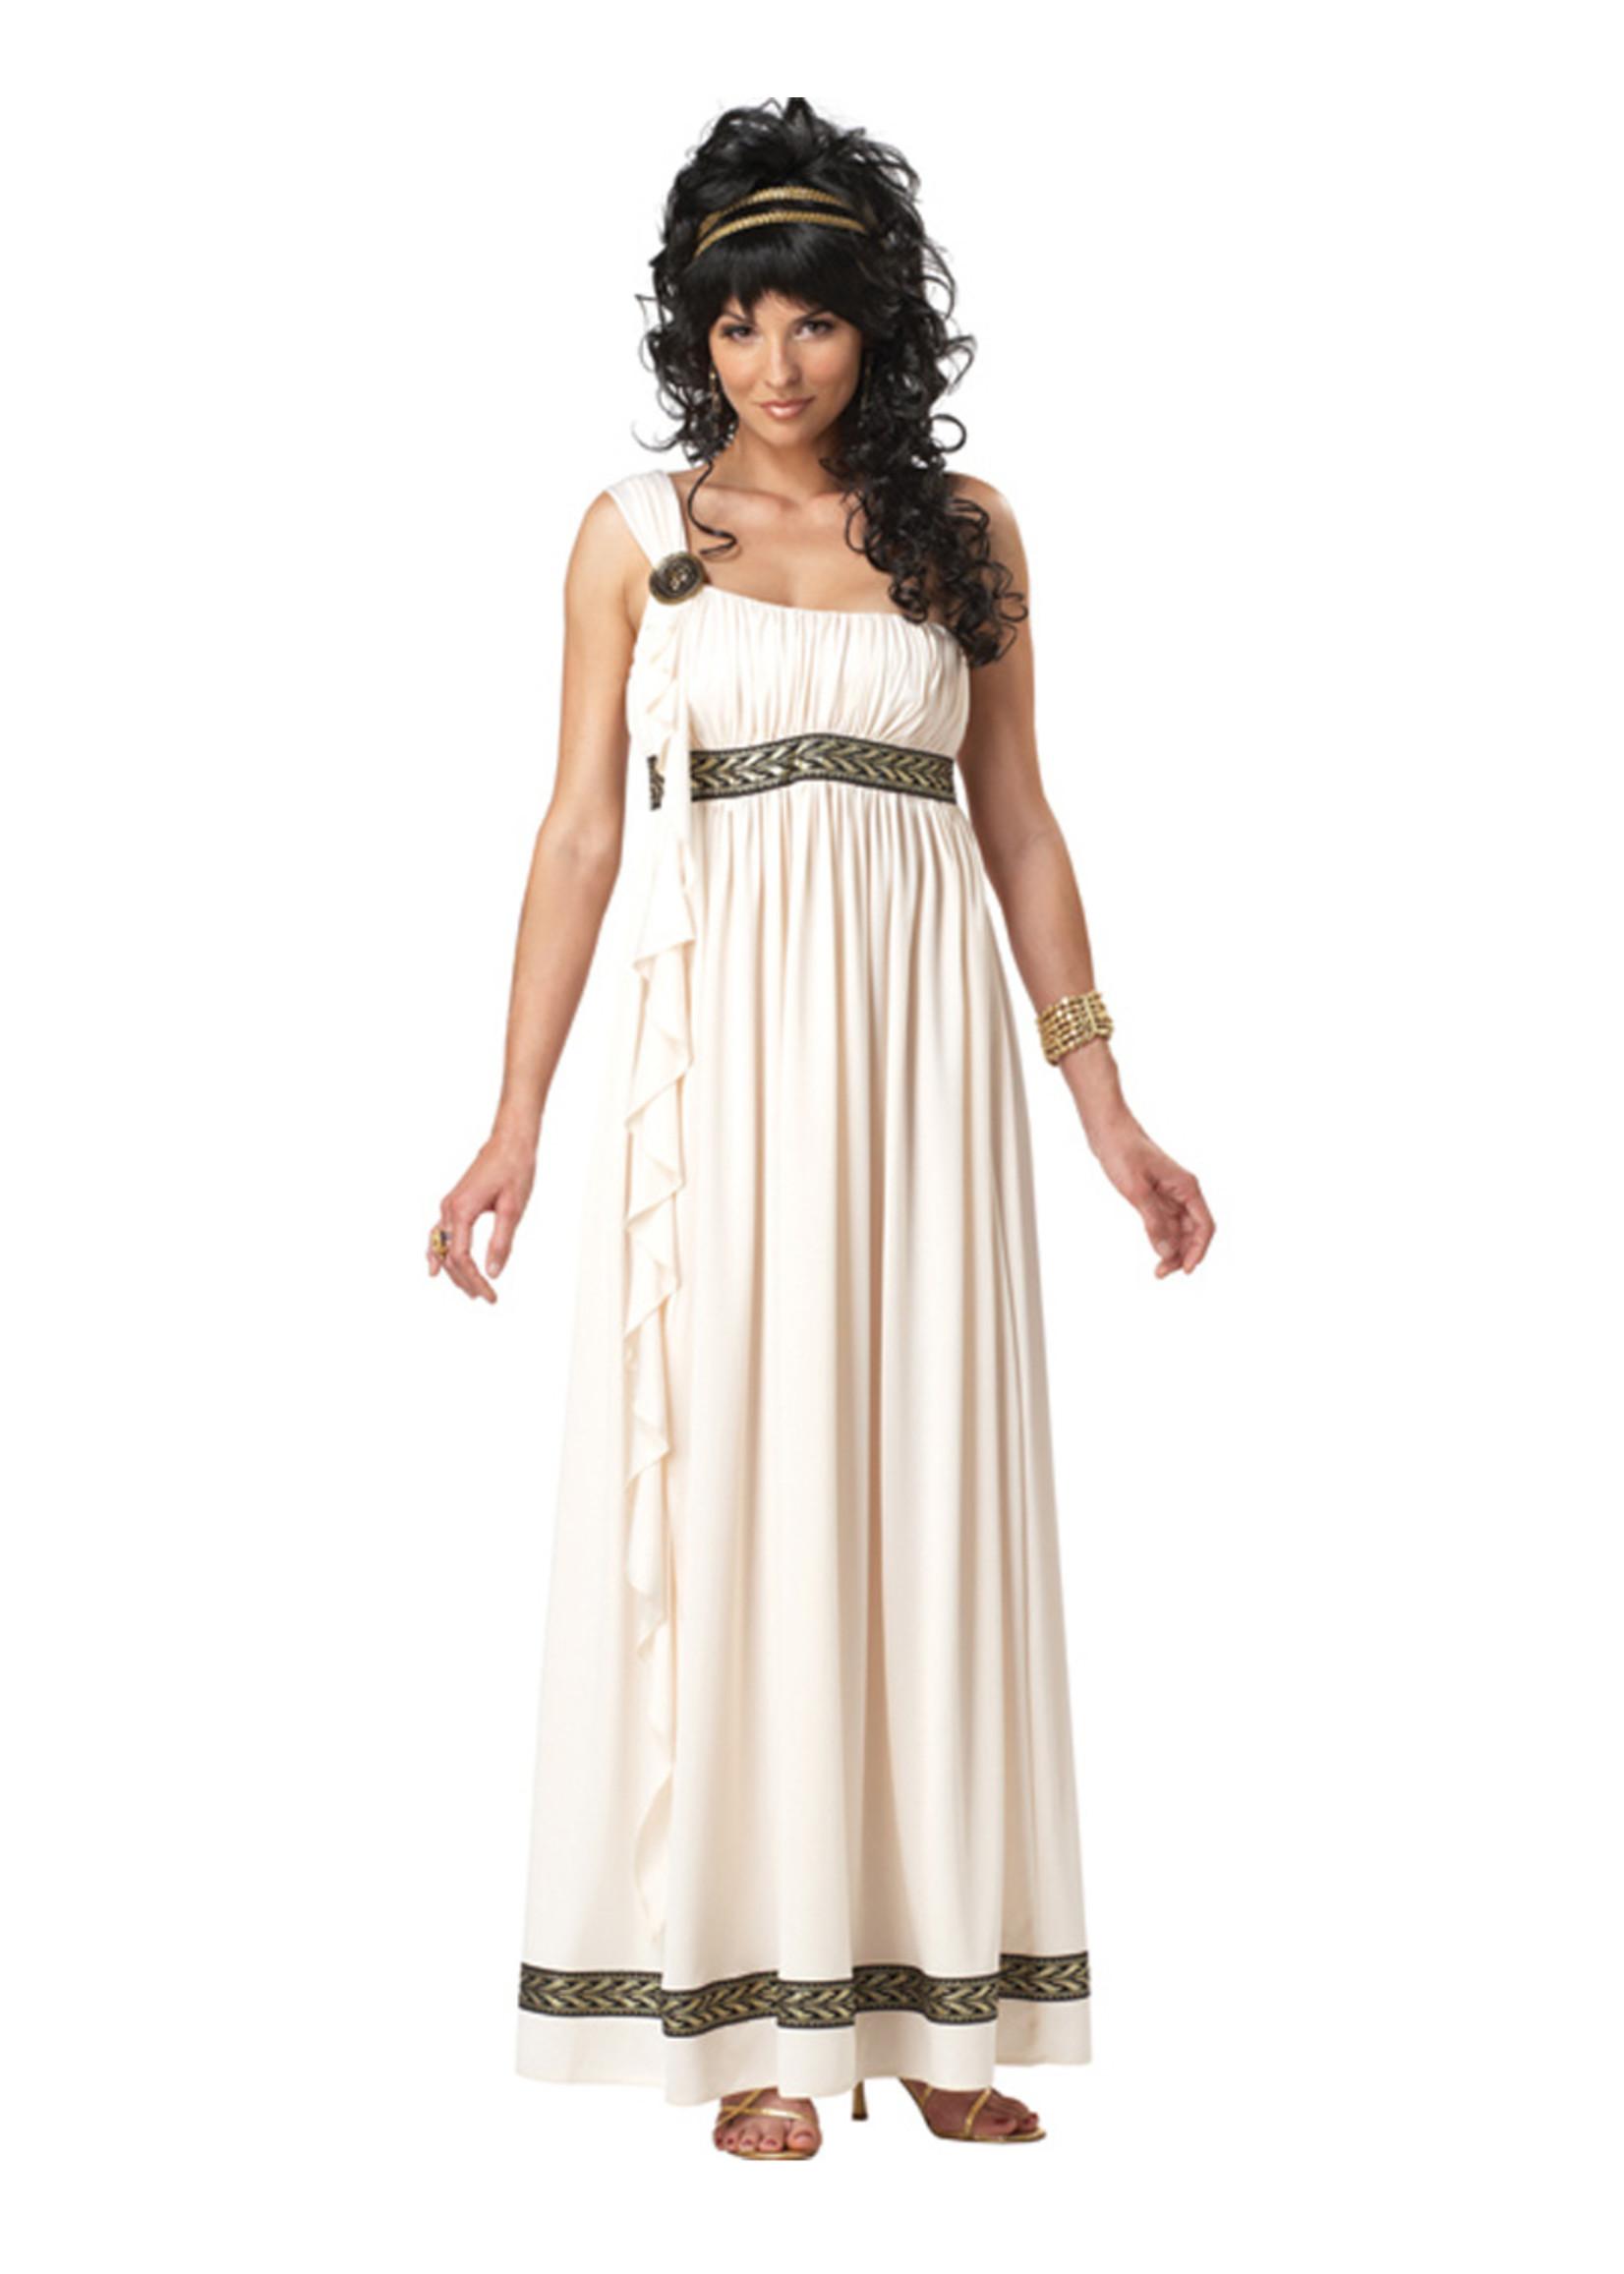 Olympic Goddess Costume - Women's